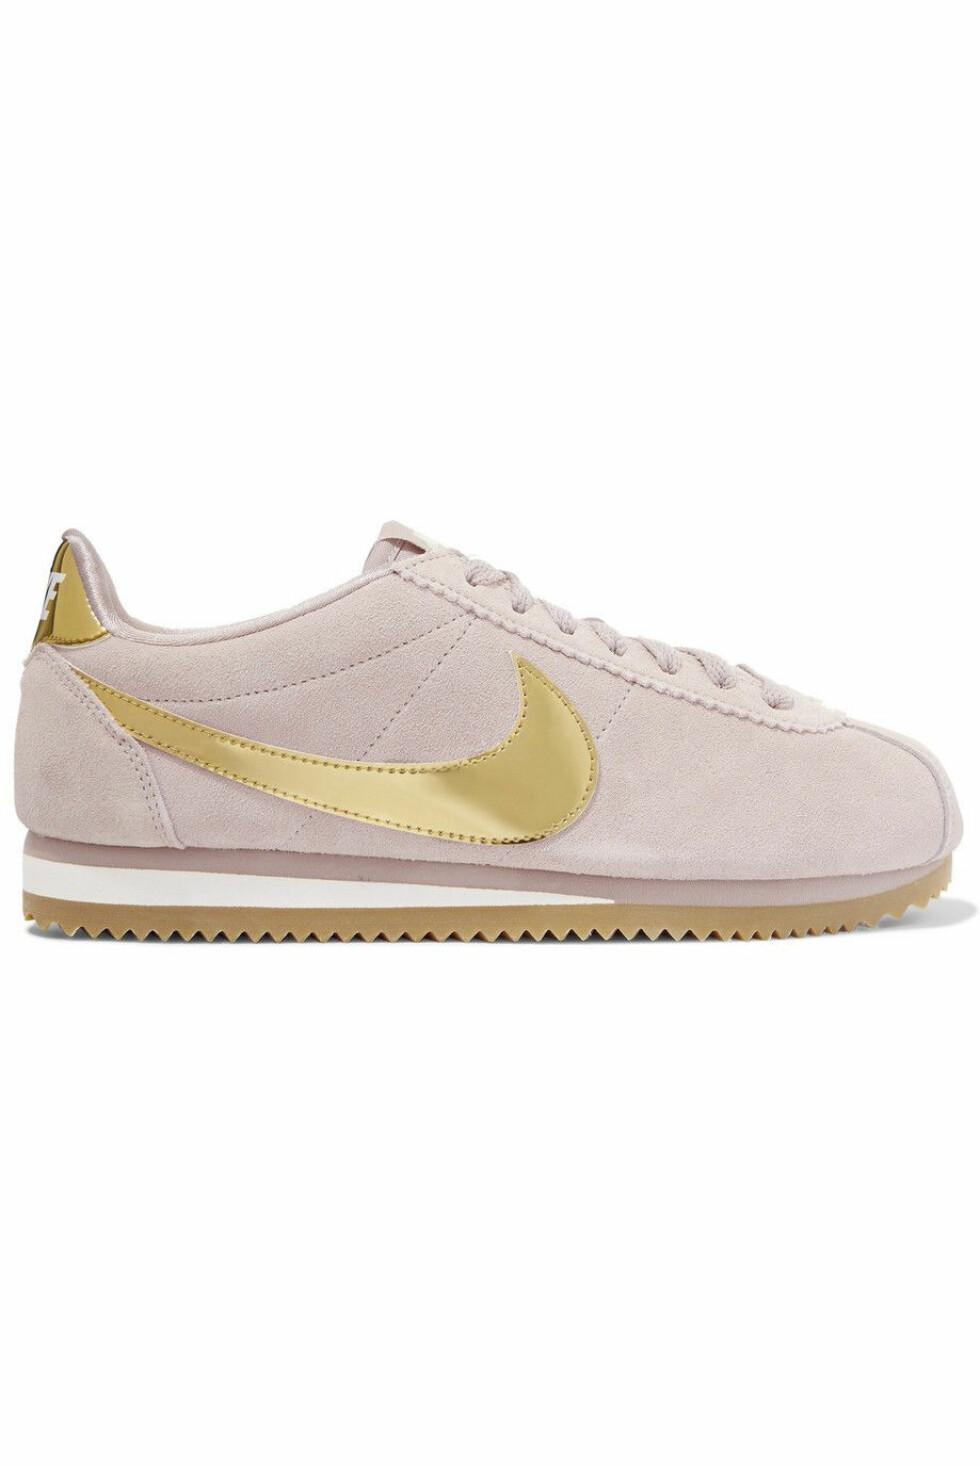 Nike, kr 1000